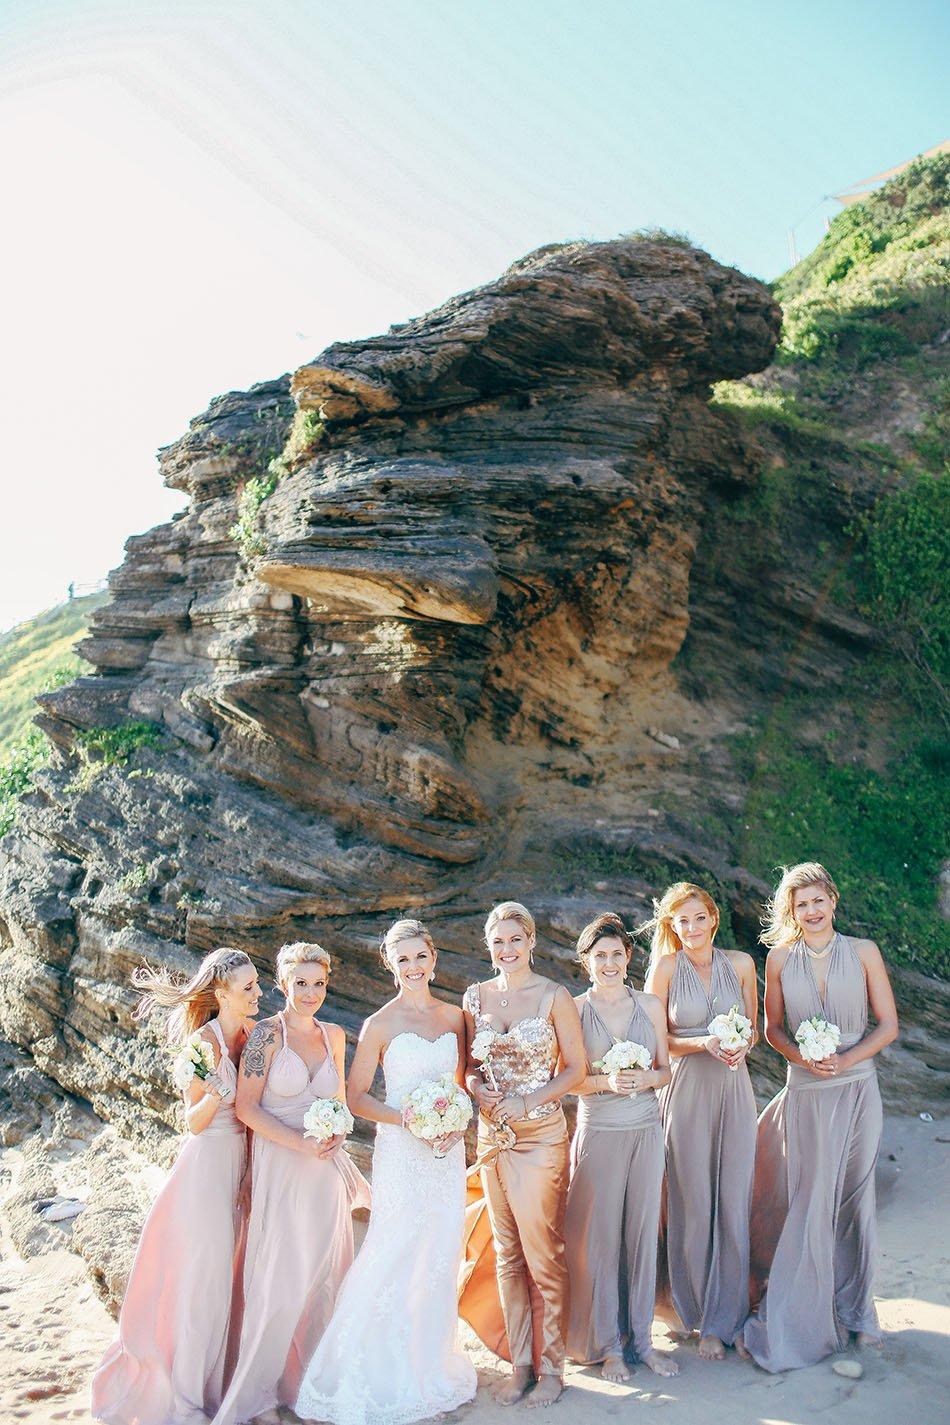 Michelle&Karien -- Married@The Views Botique Hotel&Spa, Wilderness-1313